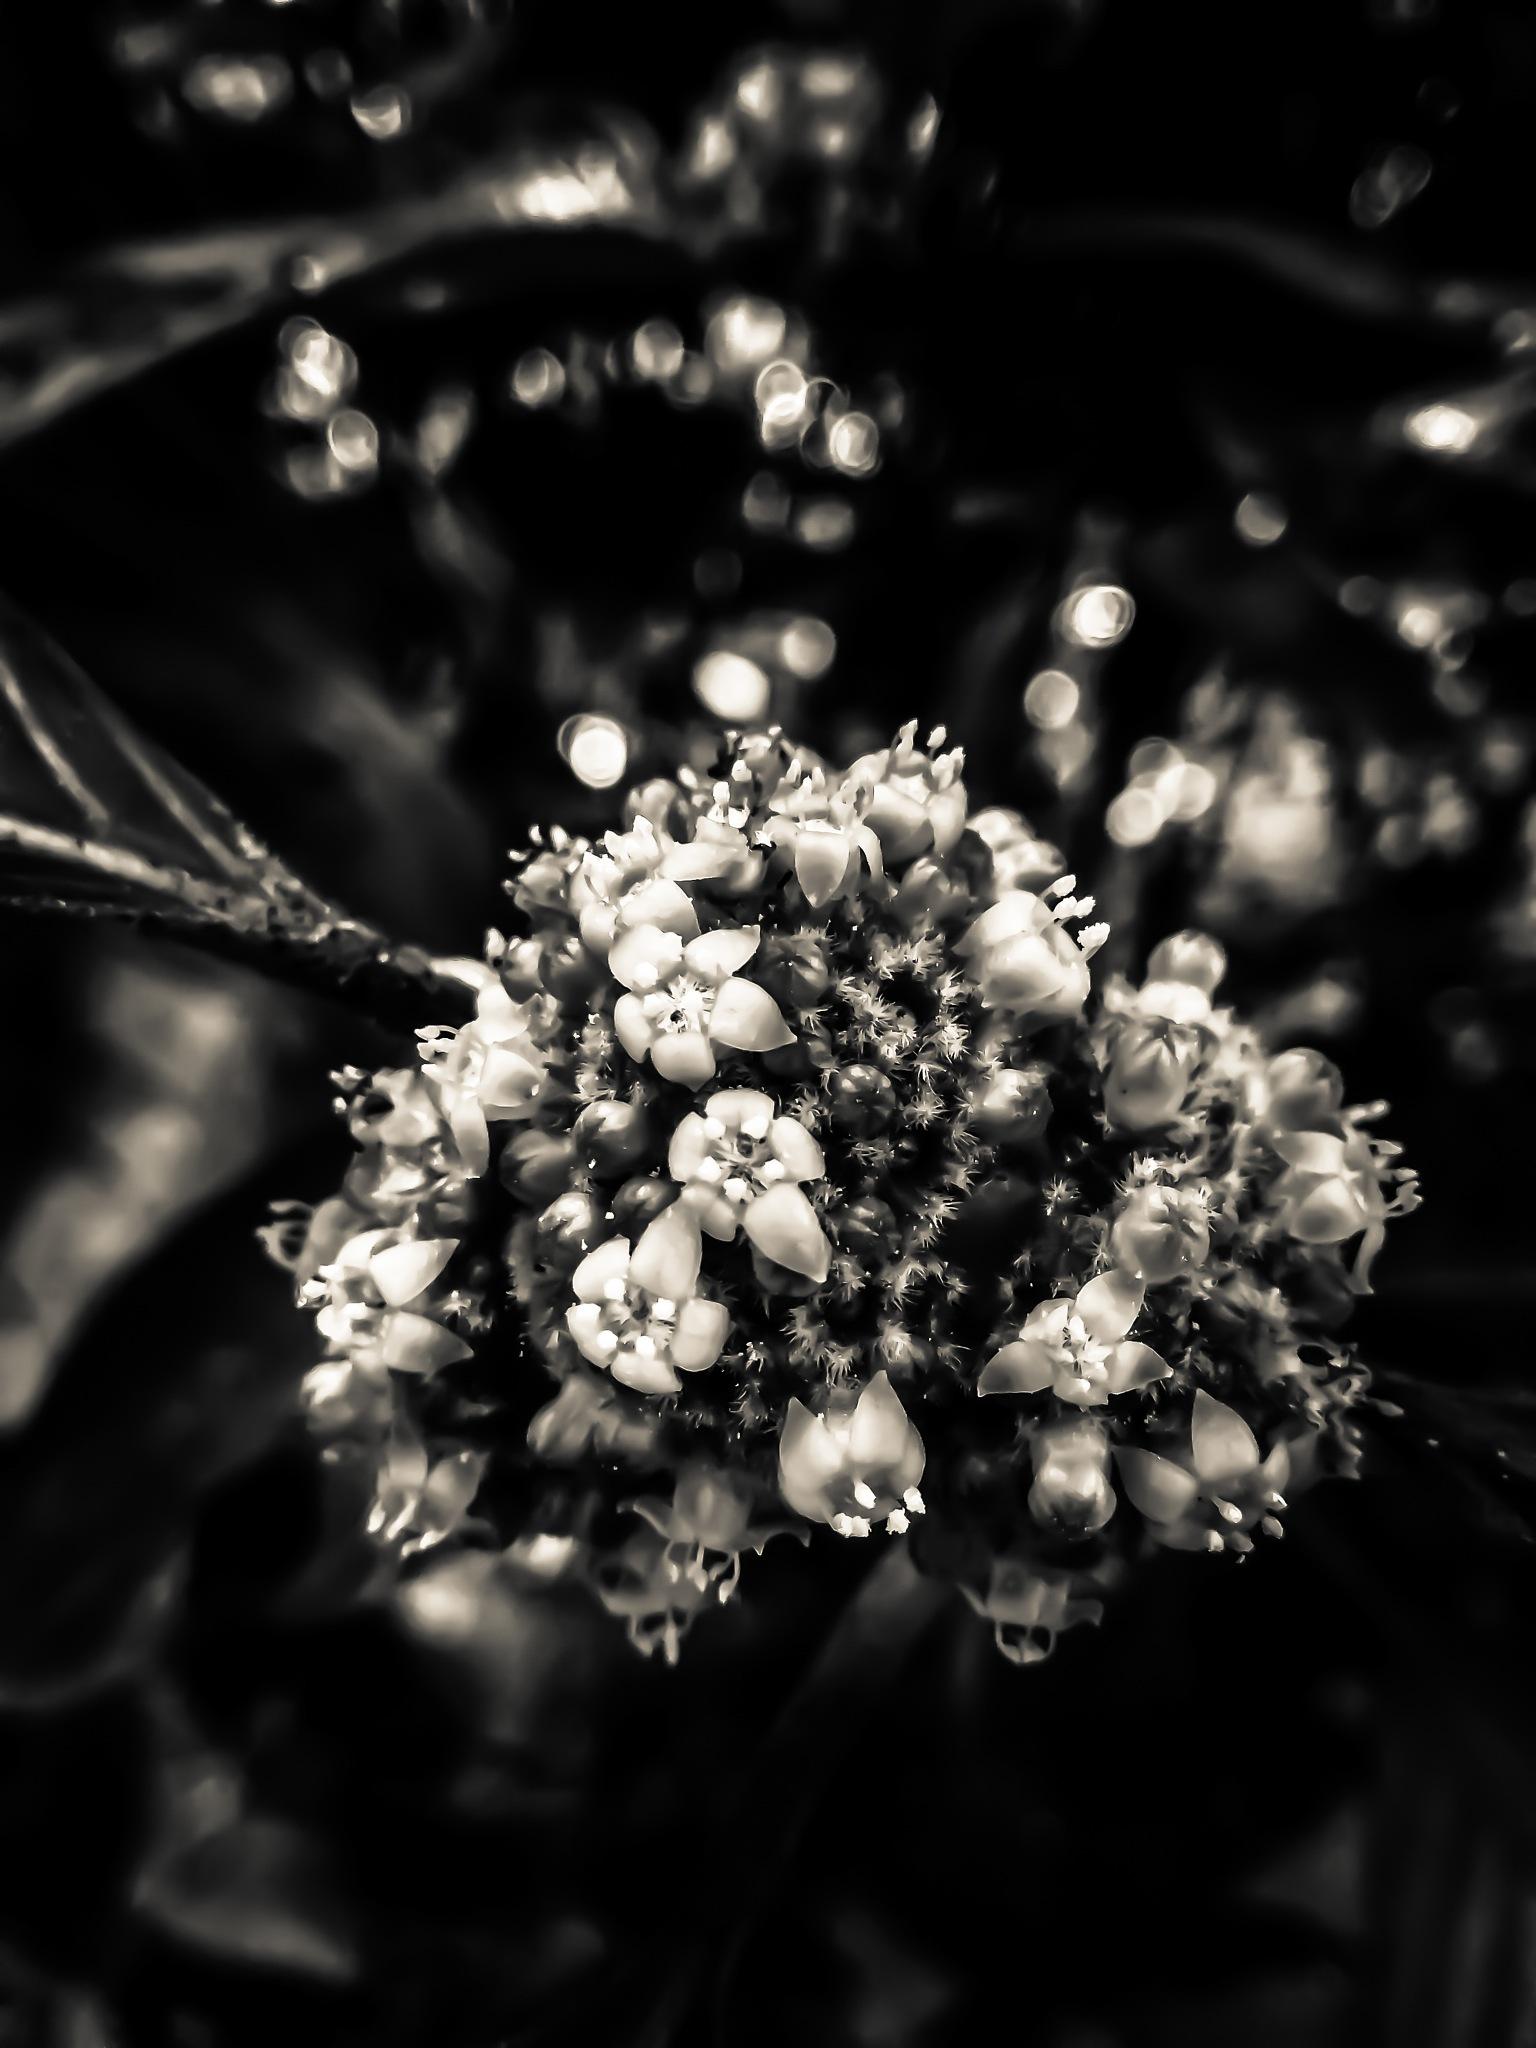 Creamy-Black by HaqPhotoscape